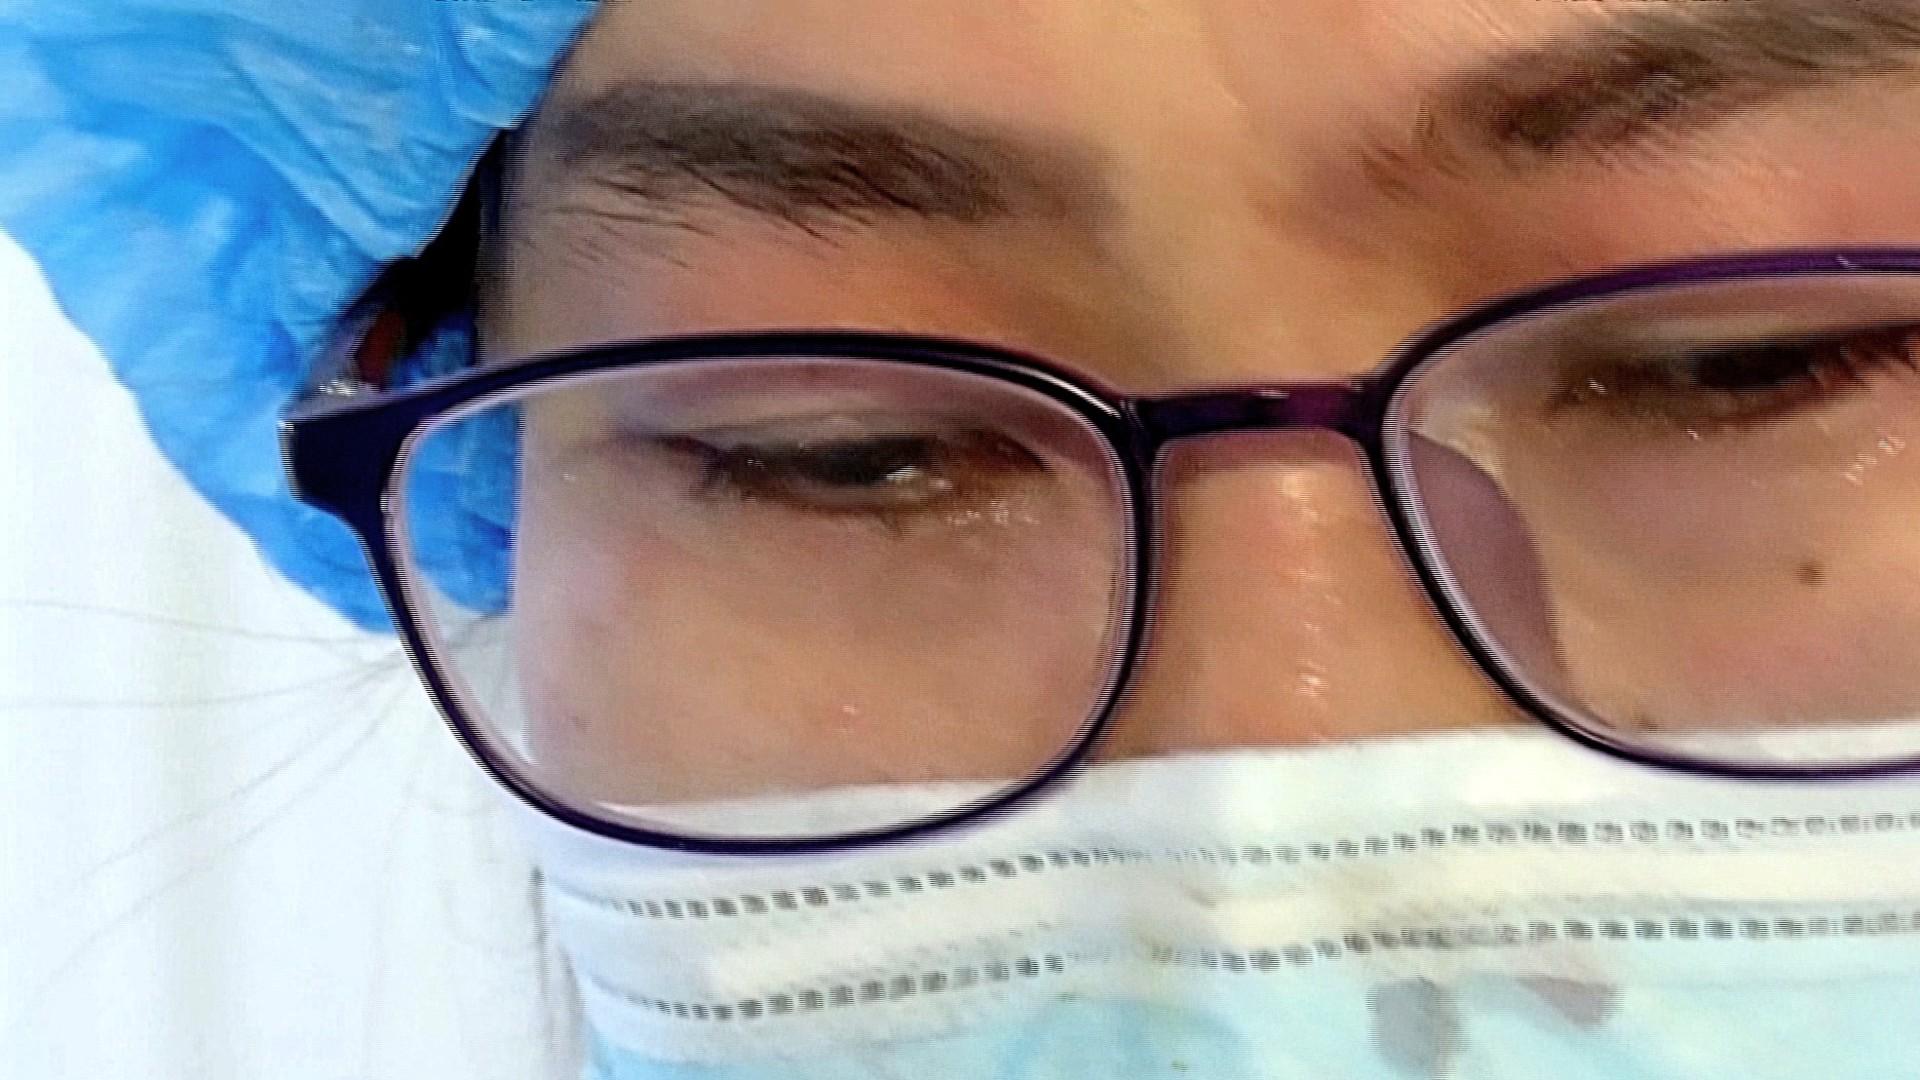 Coronavirus lockdown in China raises mental health concerns